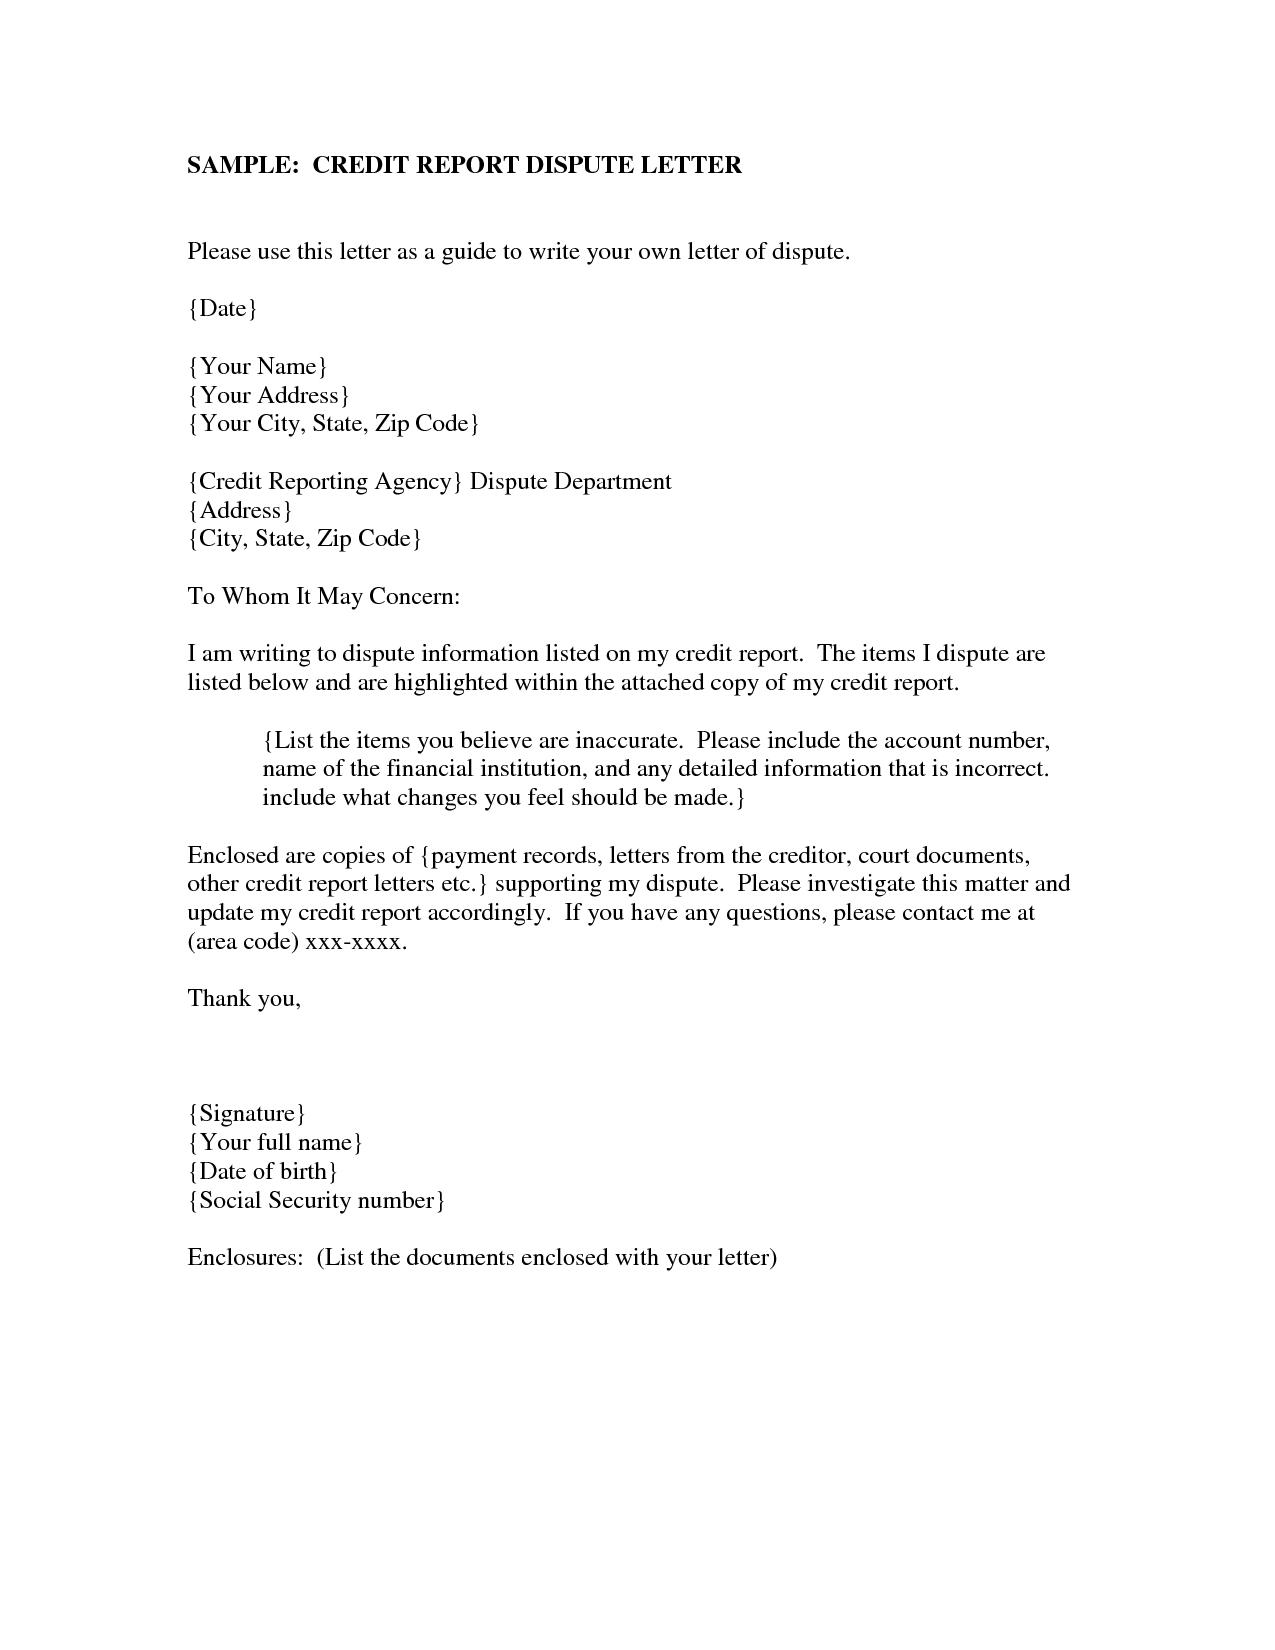 Dispute Credit Letter  Sansurabionetassociats Inside Credit Report Dispute Letter Template